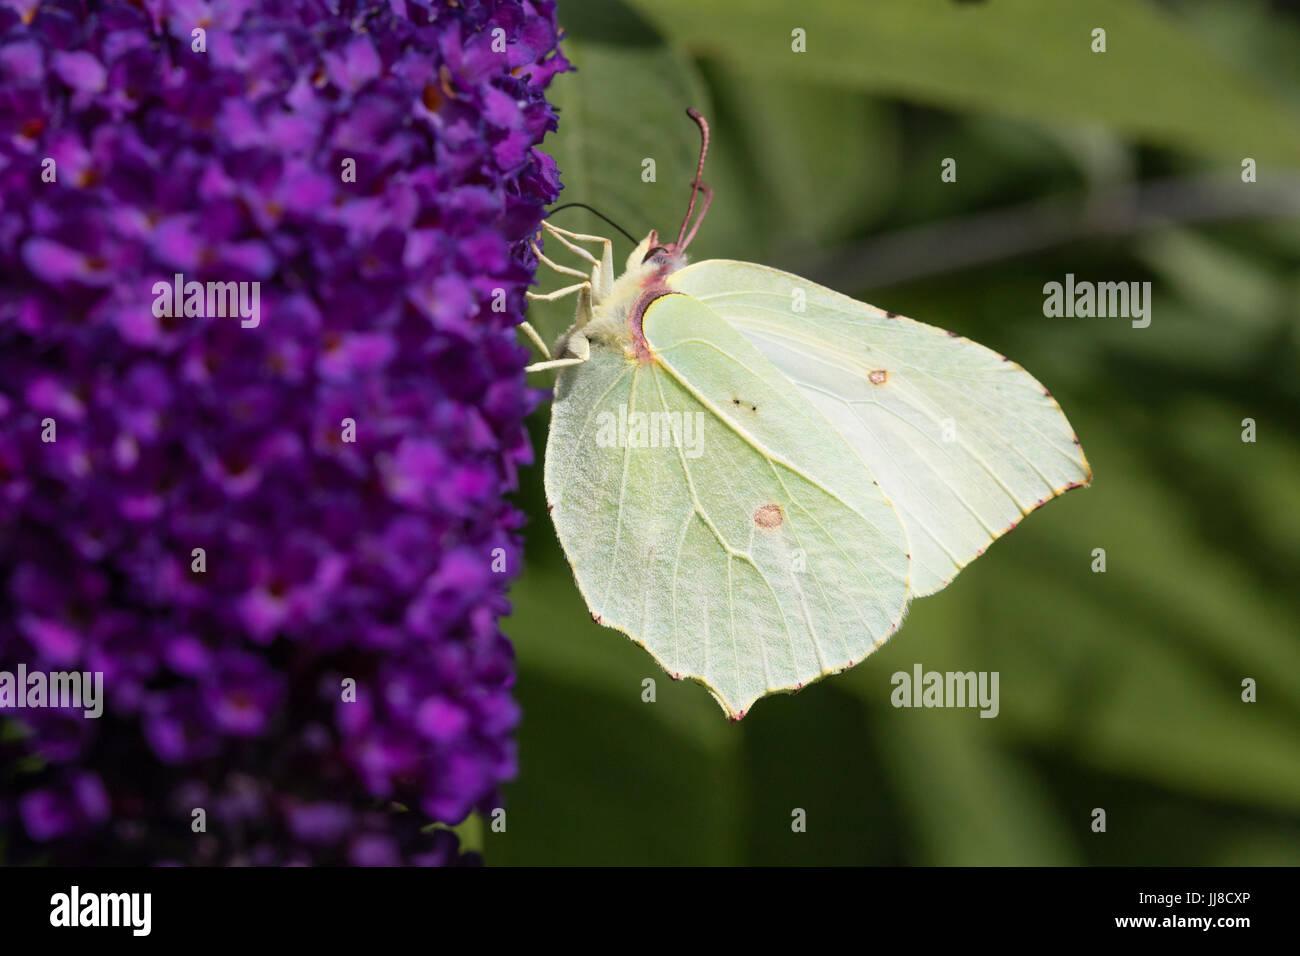 Female Brimstone butterfly, Gonepteryx rhamni, feeding on the flower panicle of Buddleja davidii 'Dreaming Lavender' Stock Photo